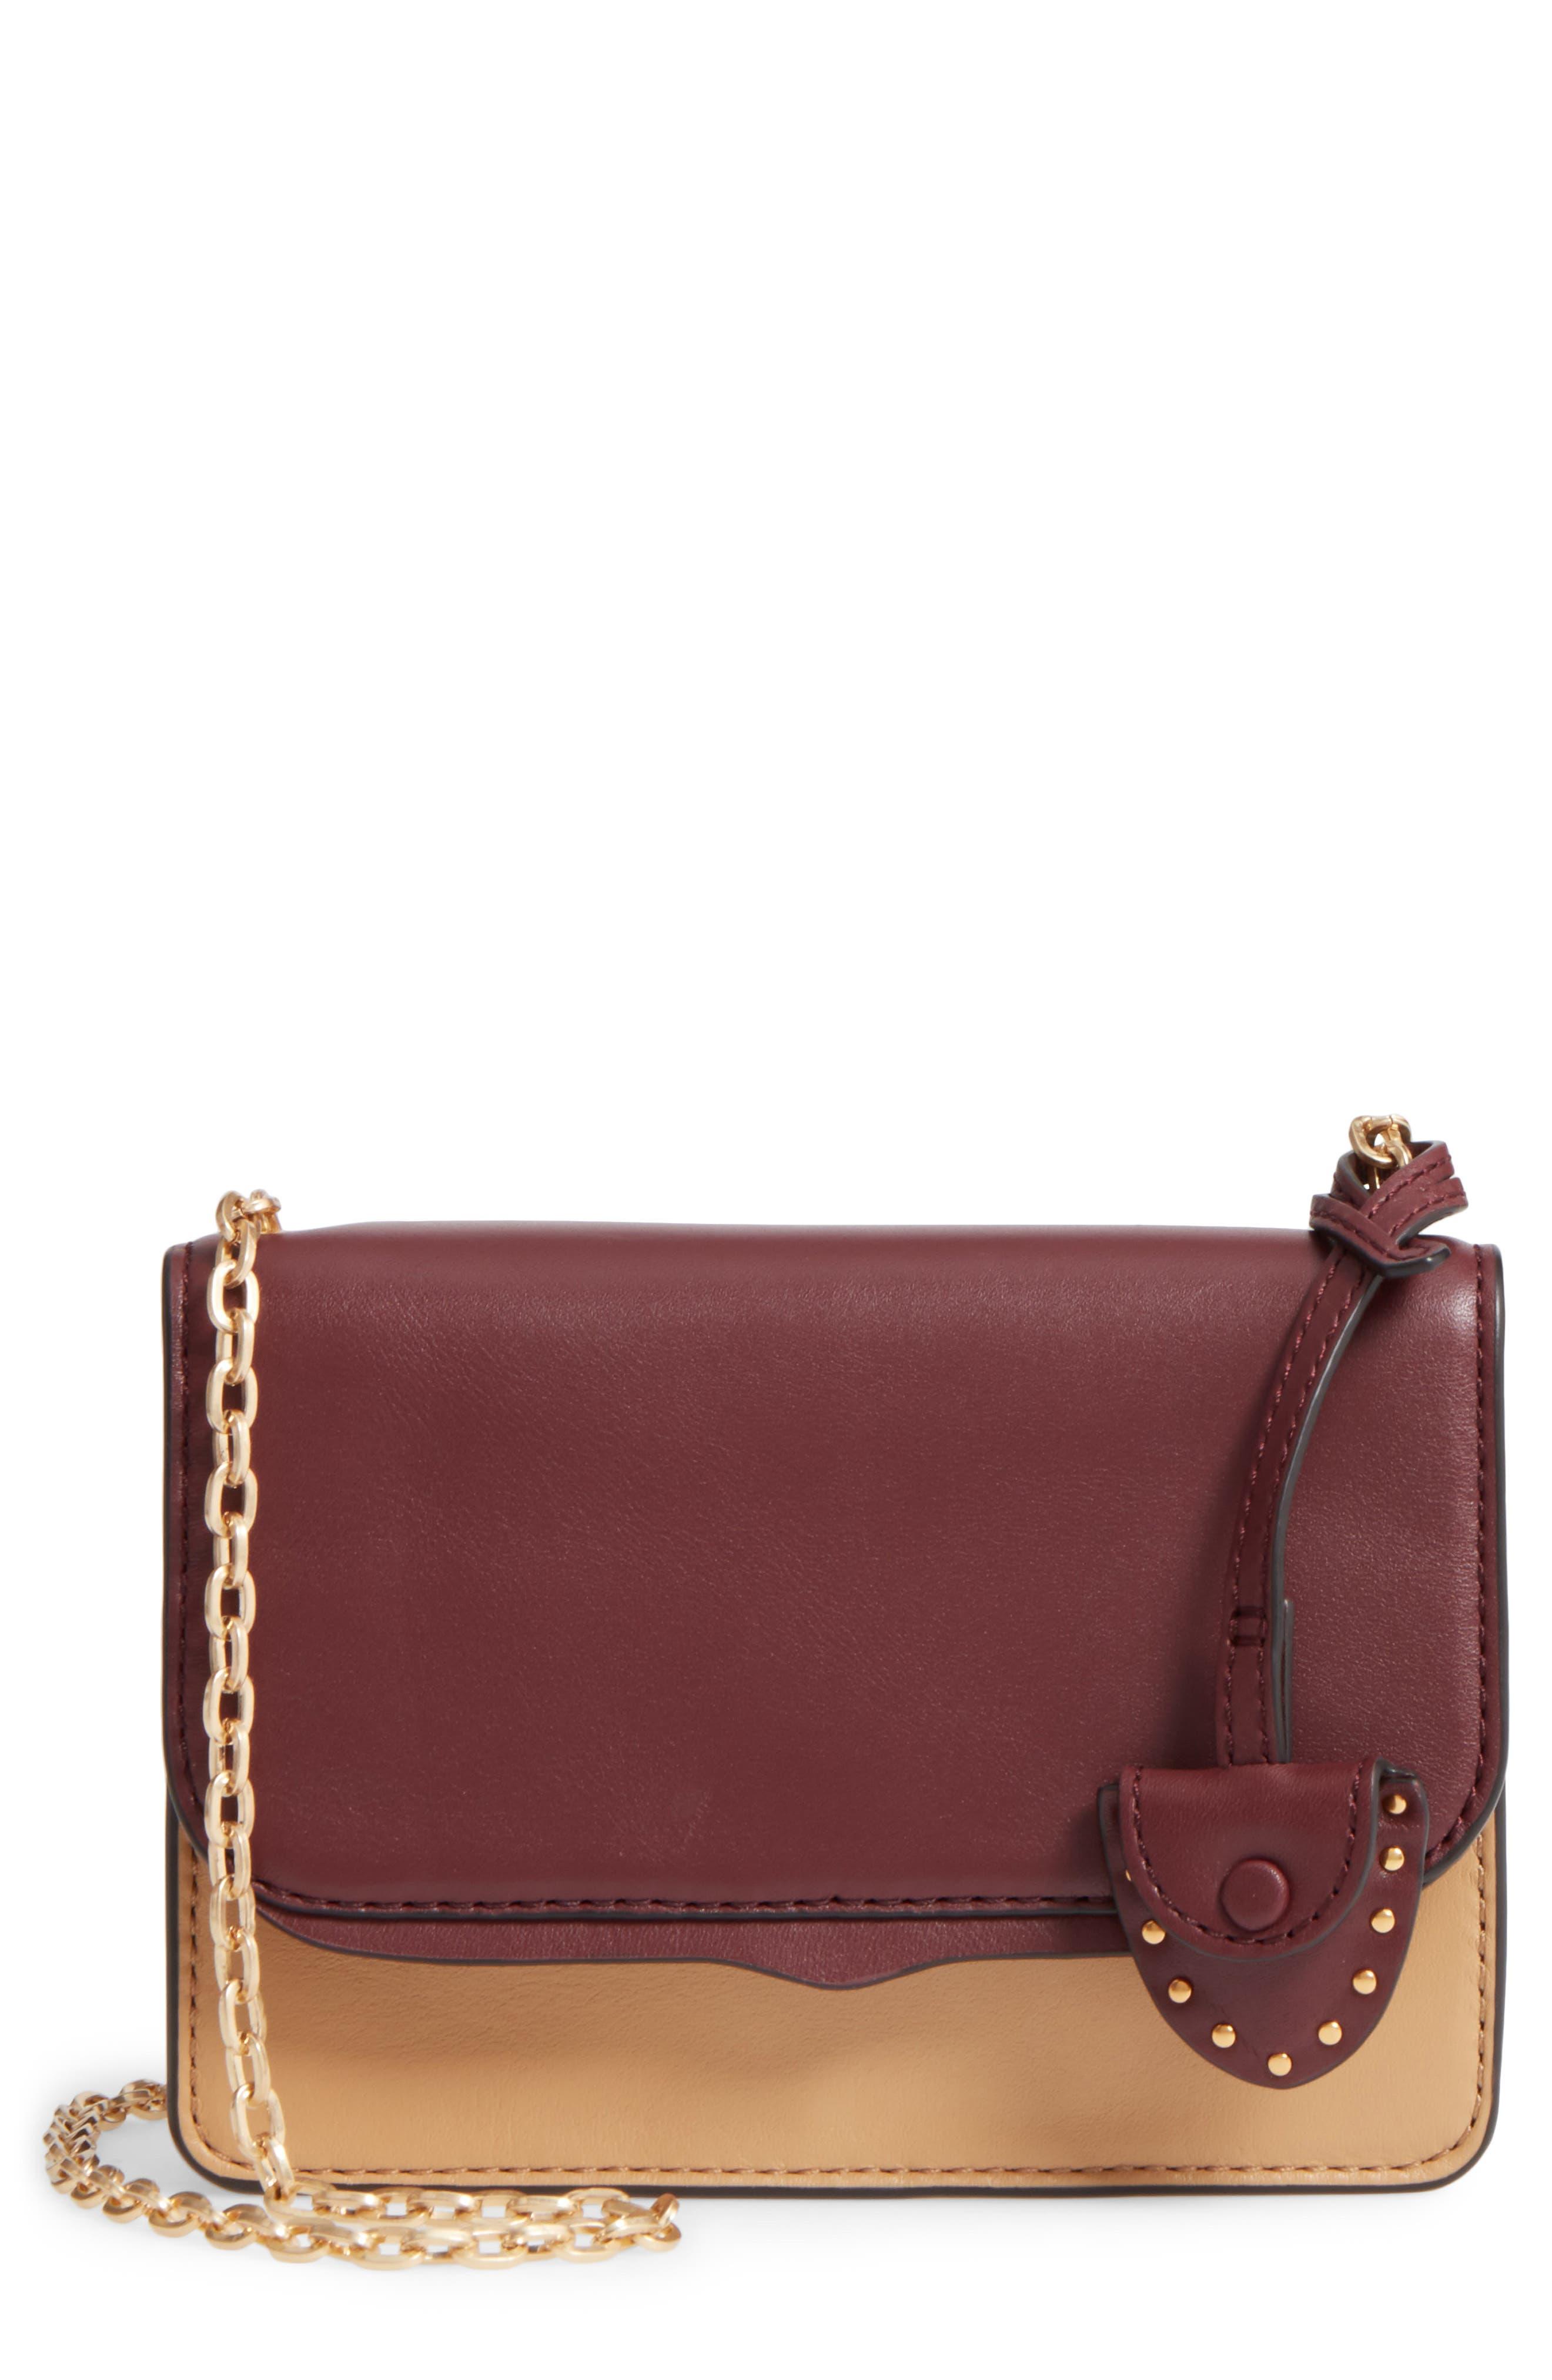 Main Image - Rebecca Minkoff Mini Chain Leather Crossbody Bag